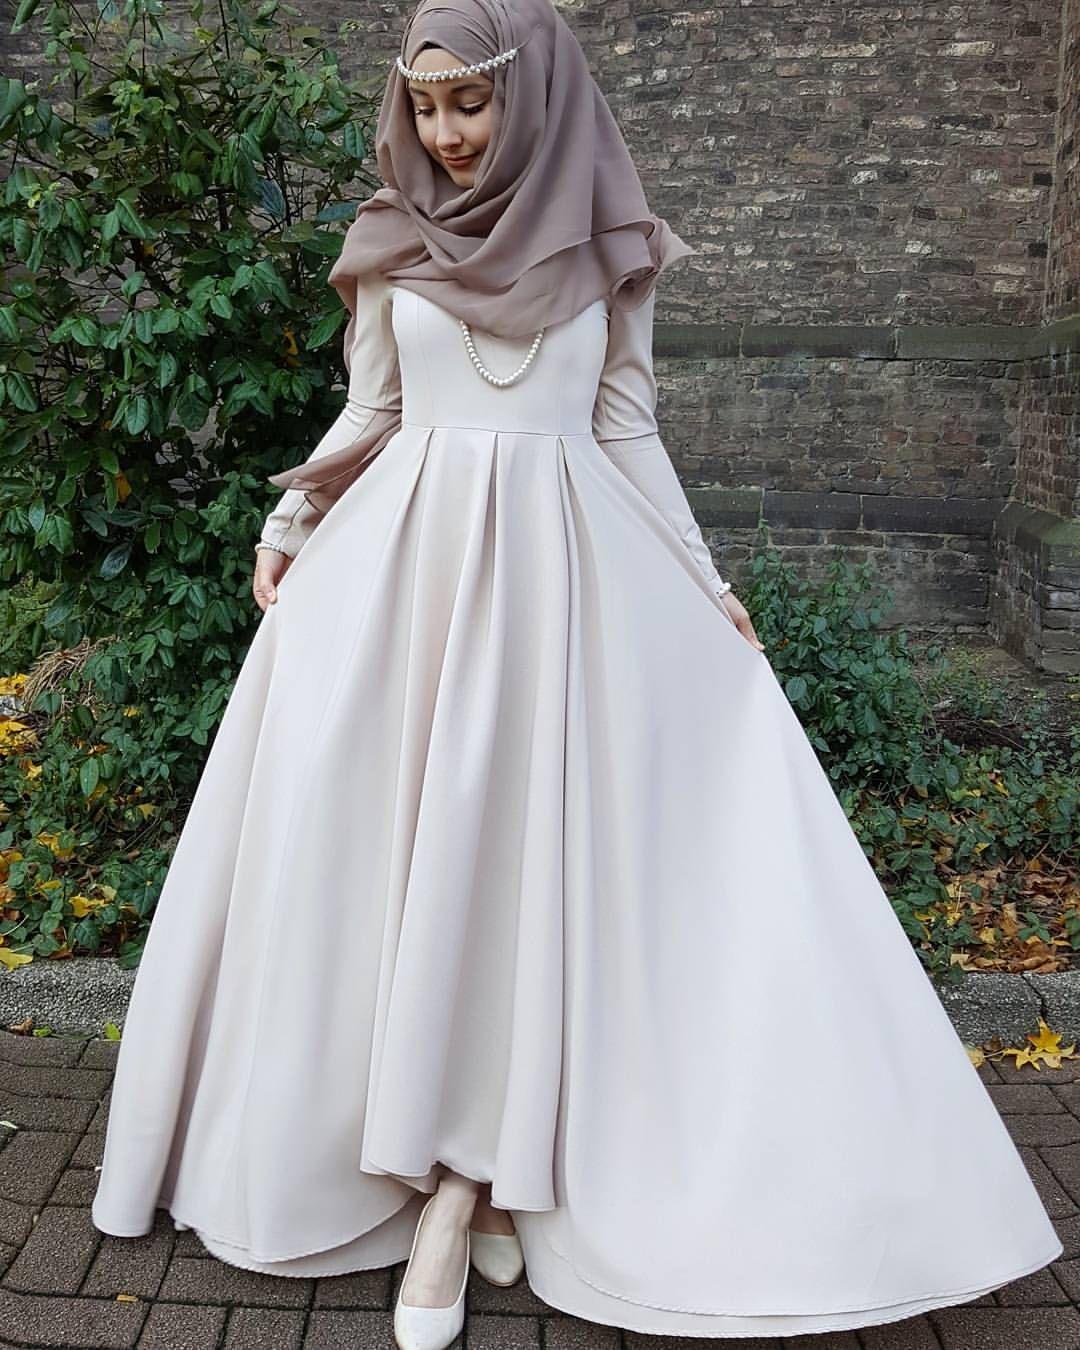 Pin By Tazkia Khan On Islamic Dresscode Hijab Dress Party Hijab